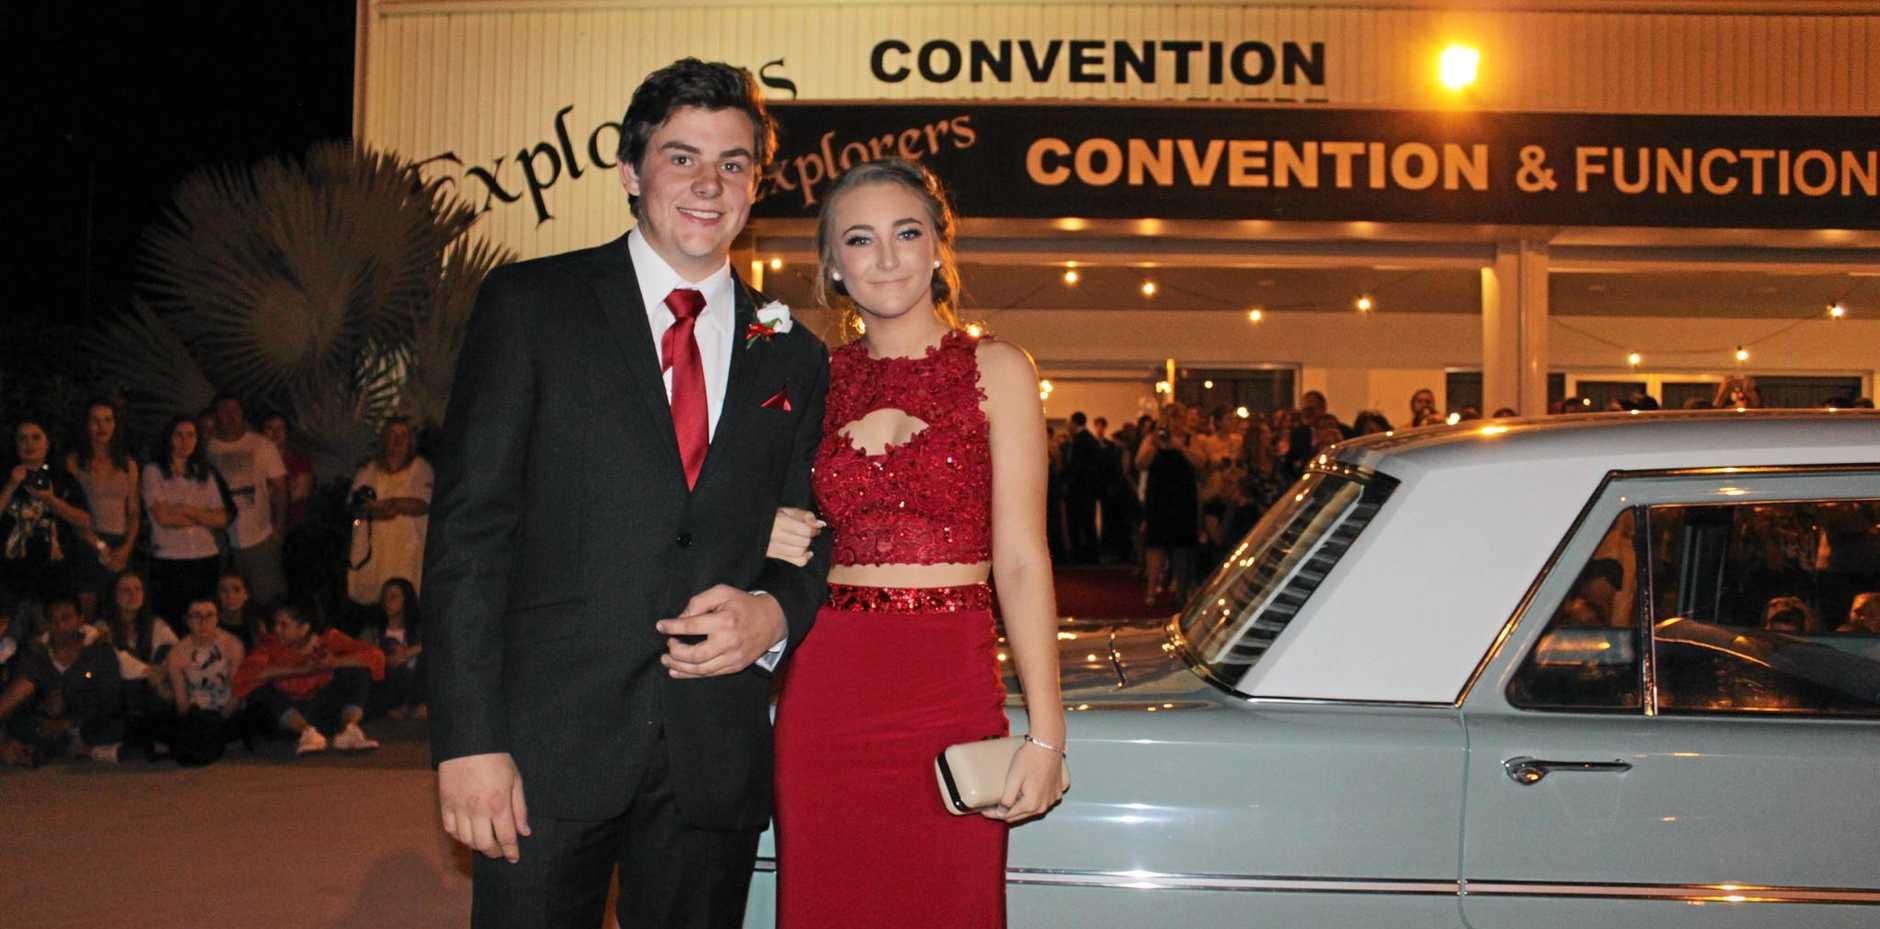 Elliot Lewis and Hope Ferguson at the St John's Formal in Roma.